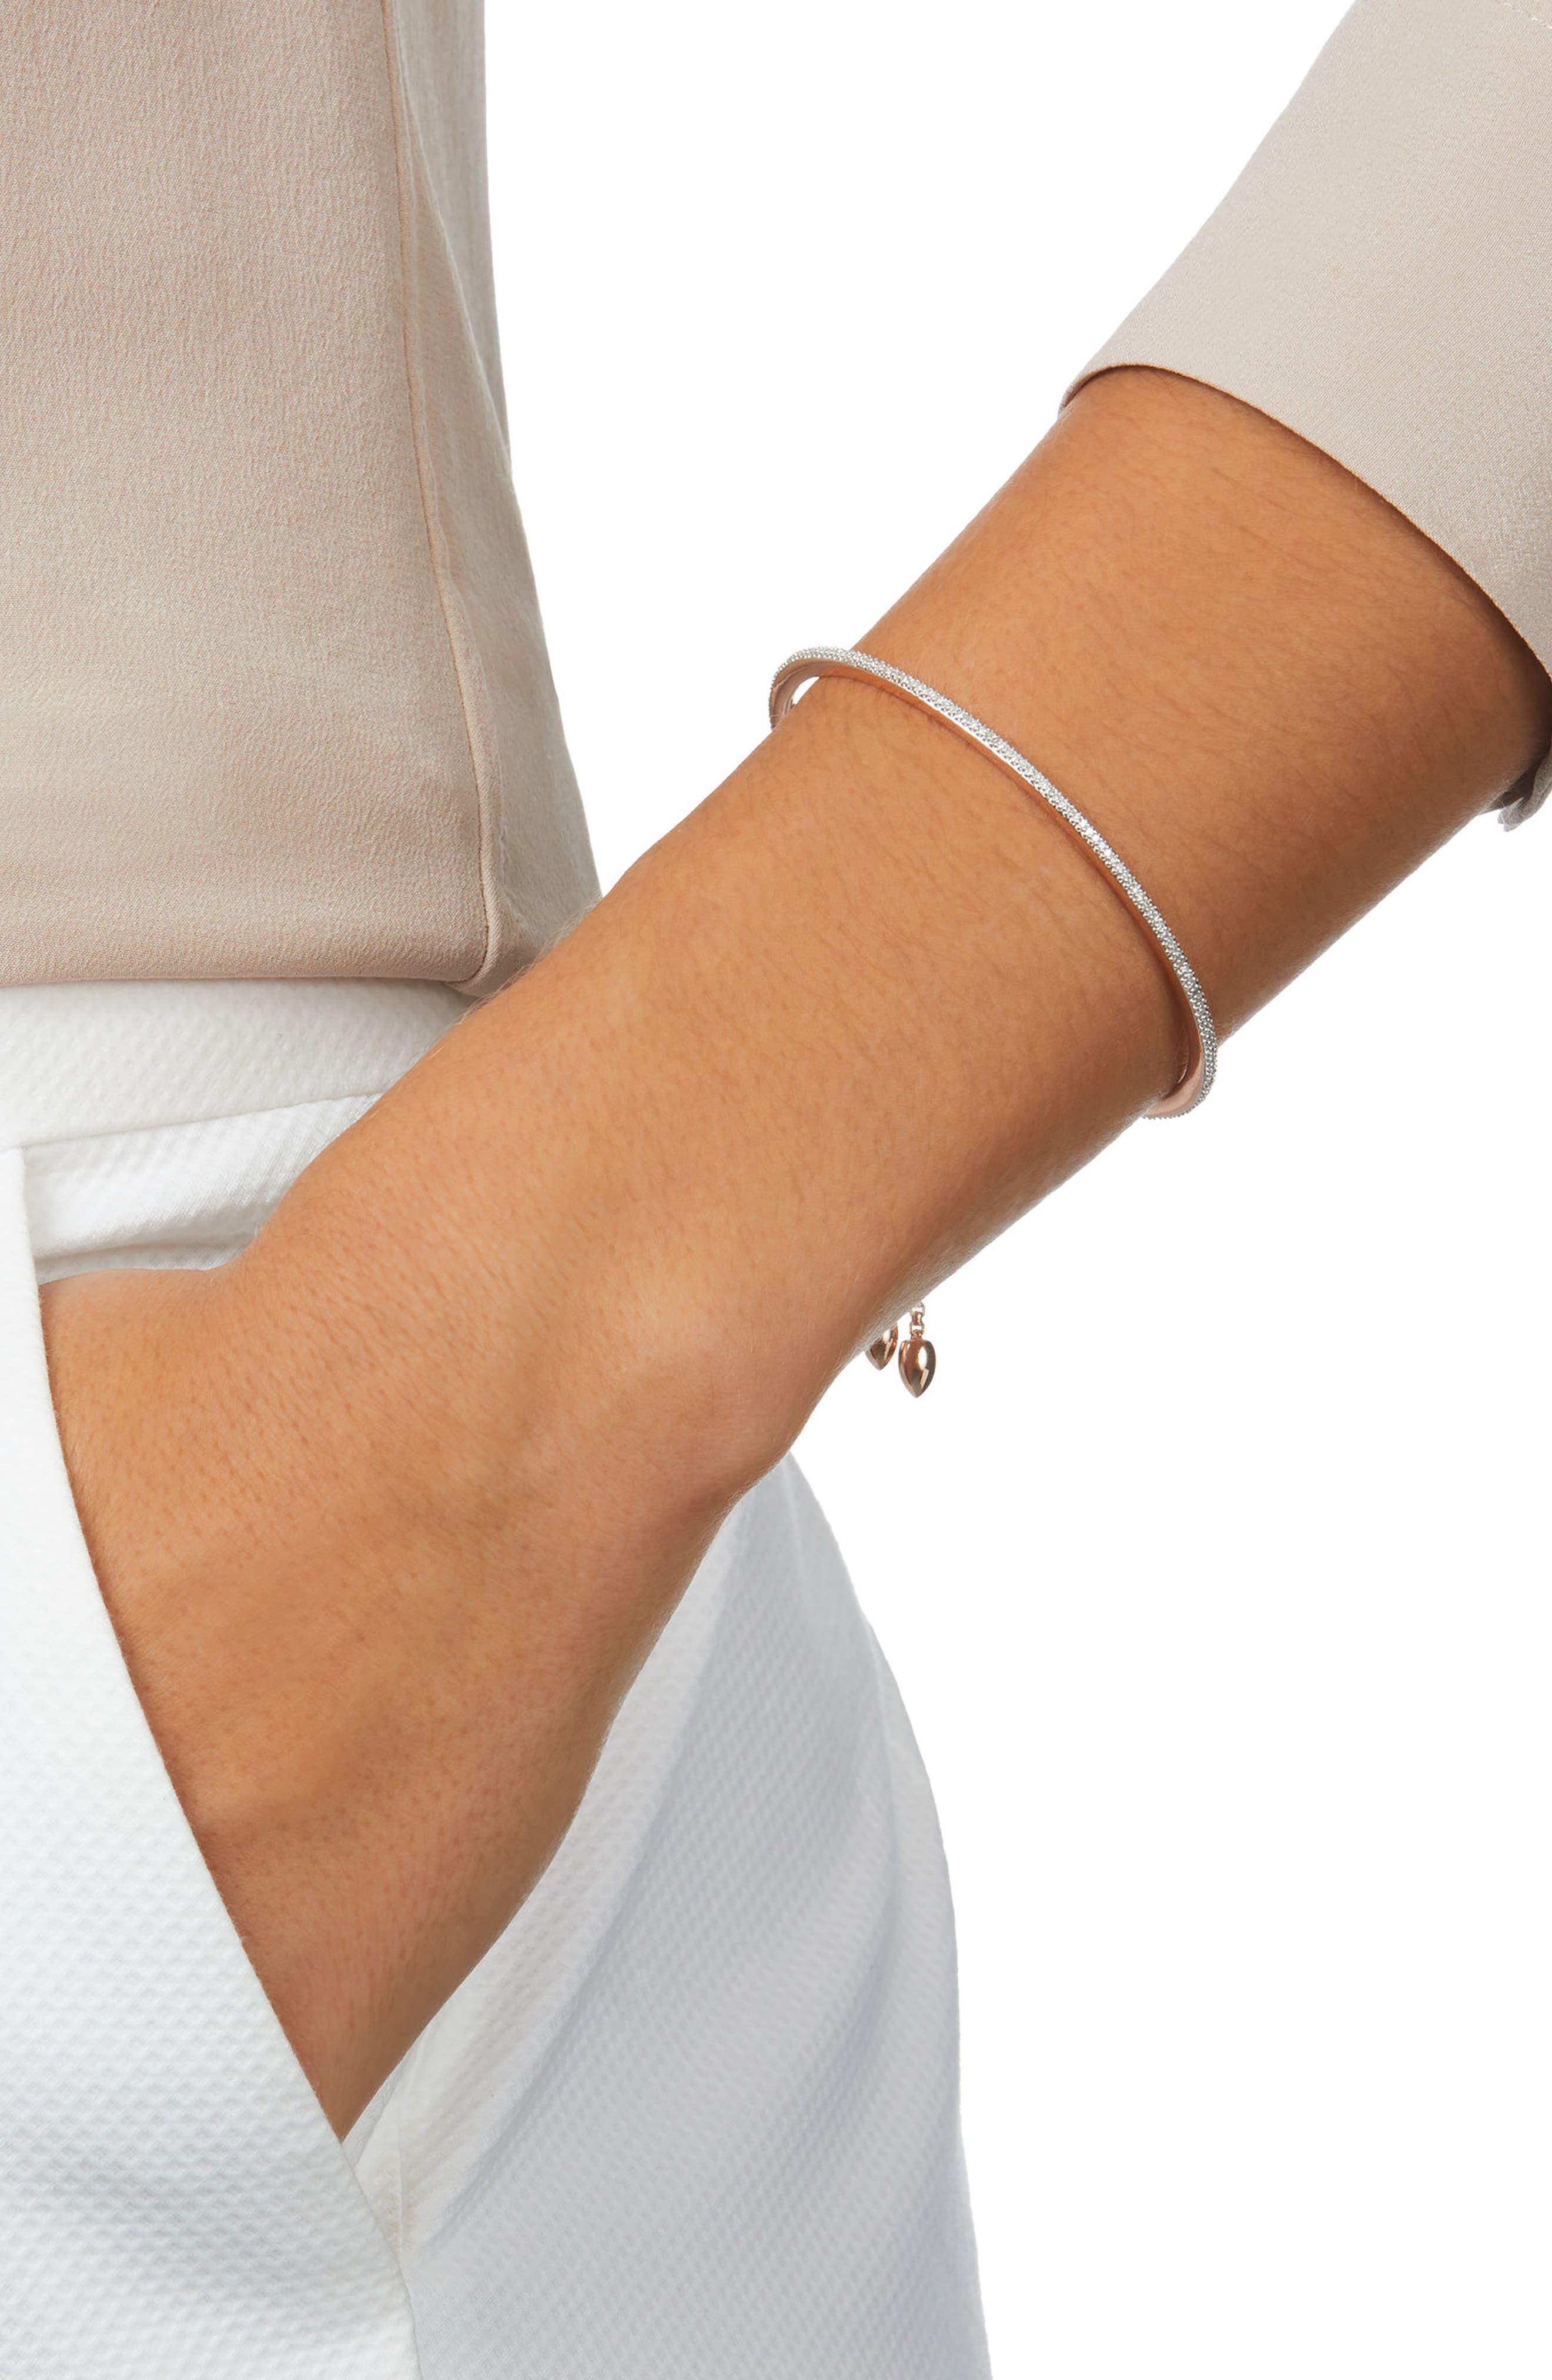 Petite Fiji Skinny Bar Chain Diamond Bracelet,                             Alternate thumbnail 2, color,                             Rose Gold